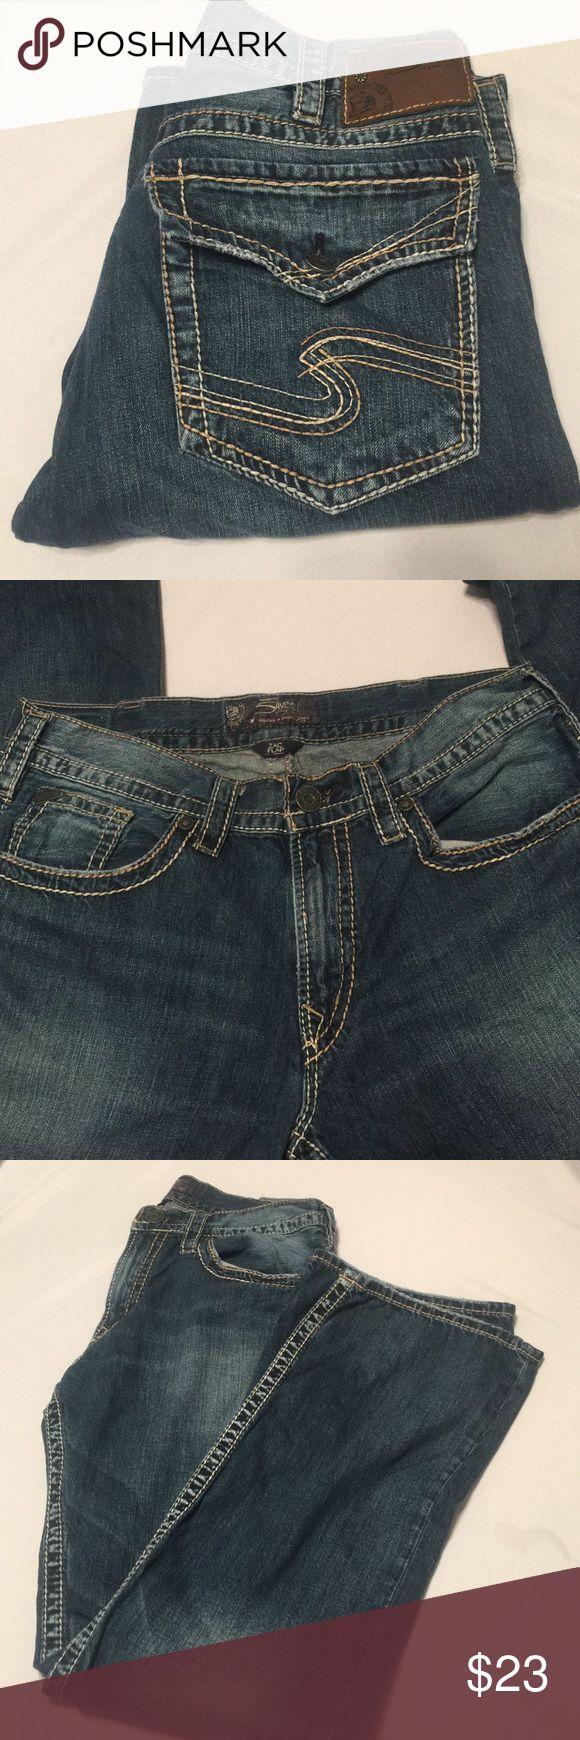 1000  ideas about Silver Jeans on Pinterest | Low cut jeans miss